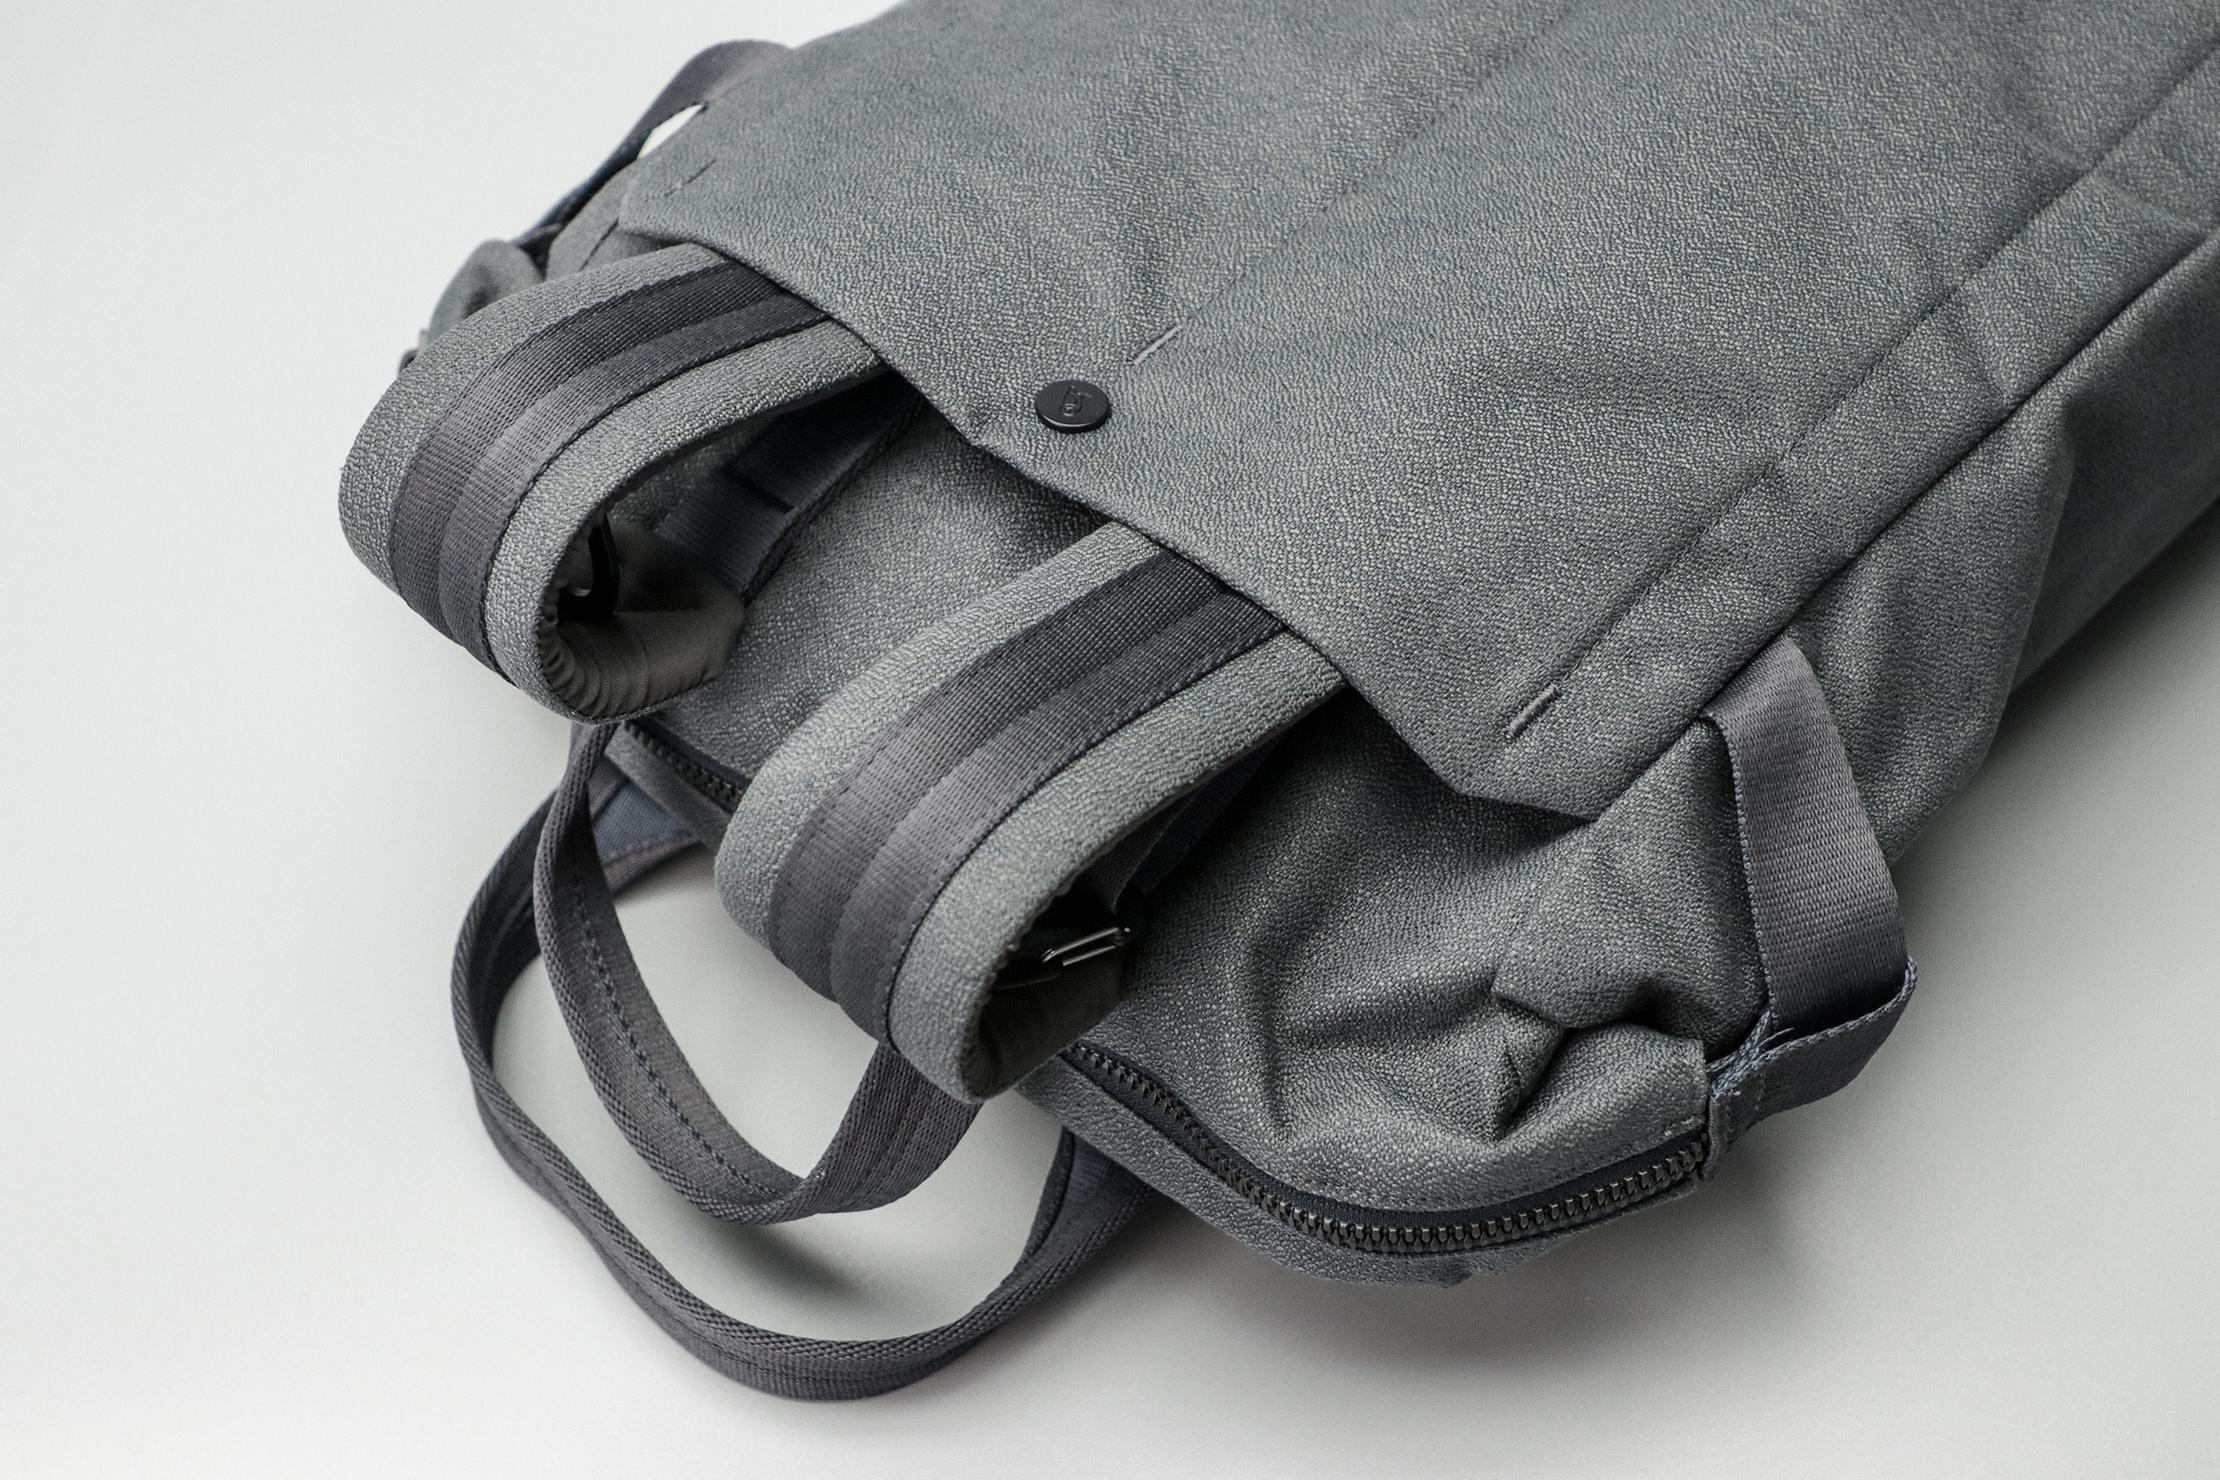 Bellroy Tokyo Totepack straps